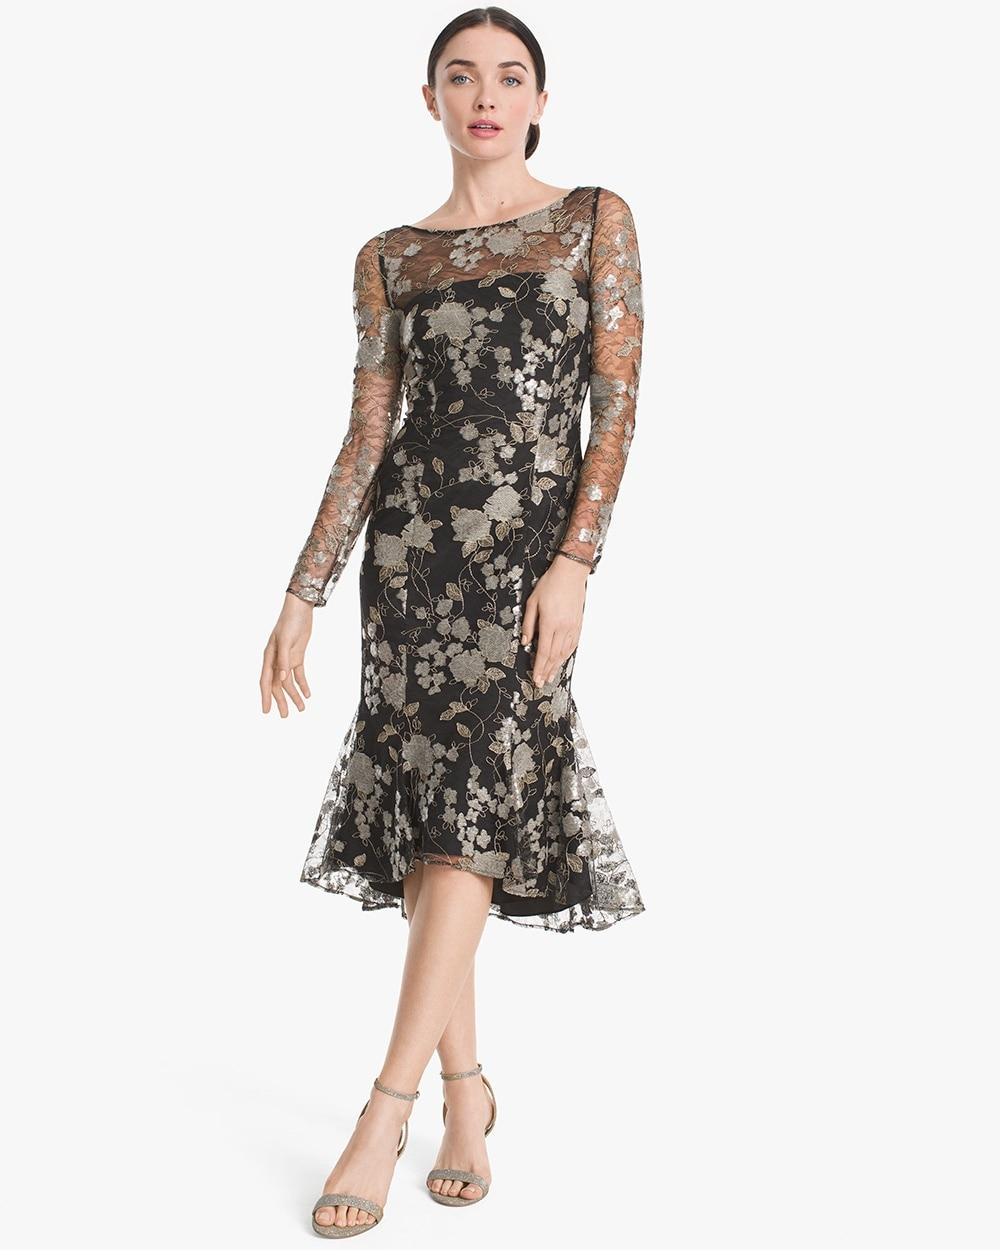 fef18cc30c Return to thumbnail image selection Illusion Floral Lace Flounce-Hem Dress  video preview image